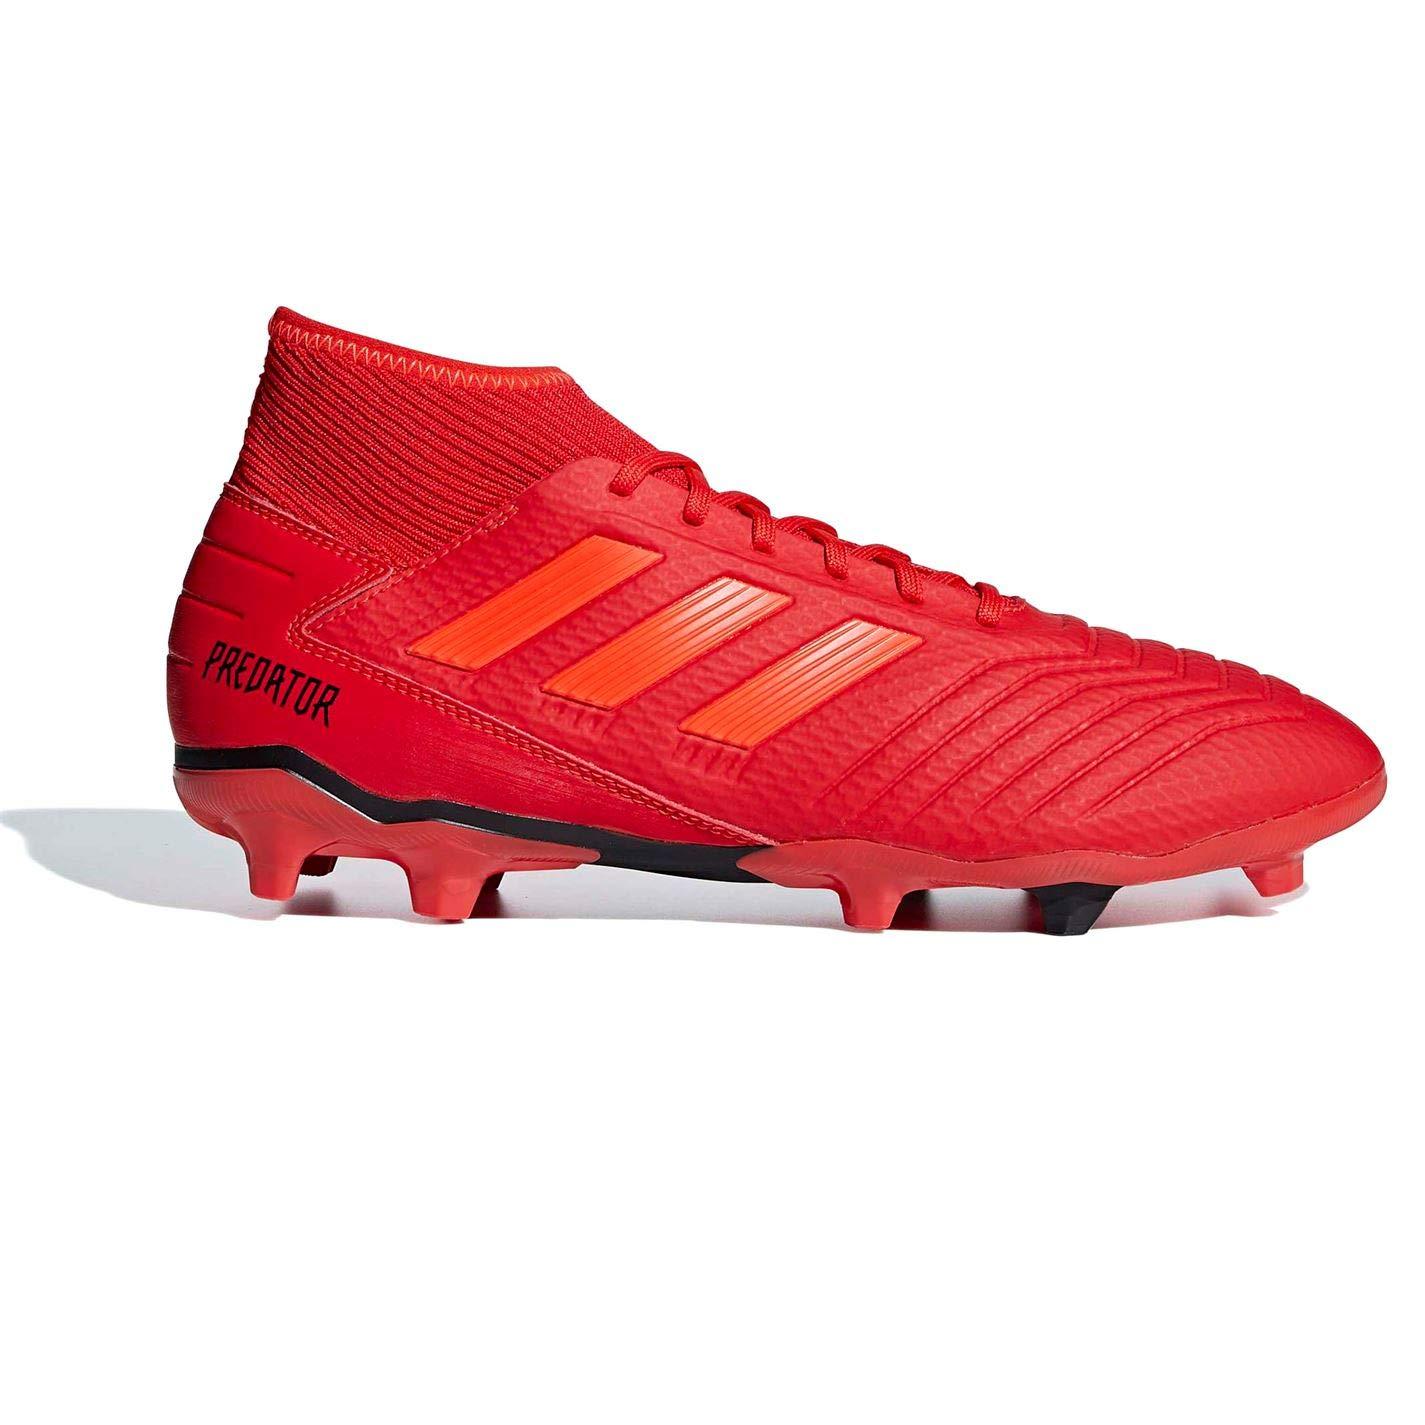 Adidas Herren PROTator 19.3 Fg Fußballschuhe